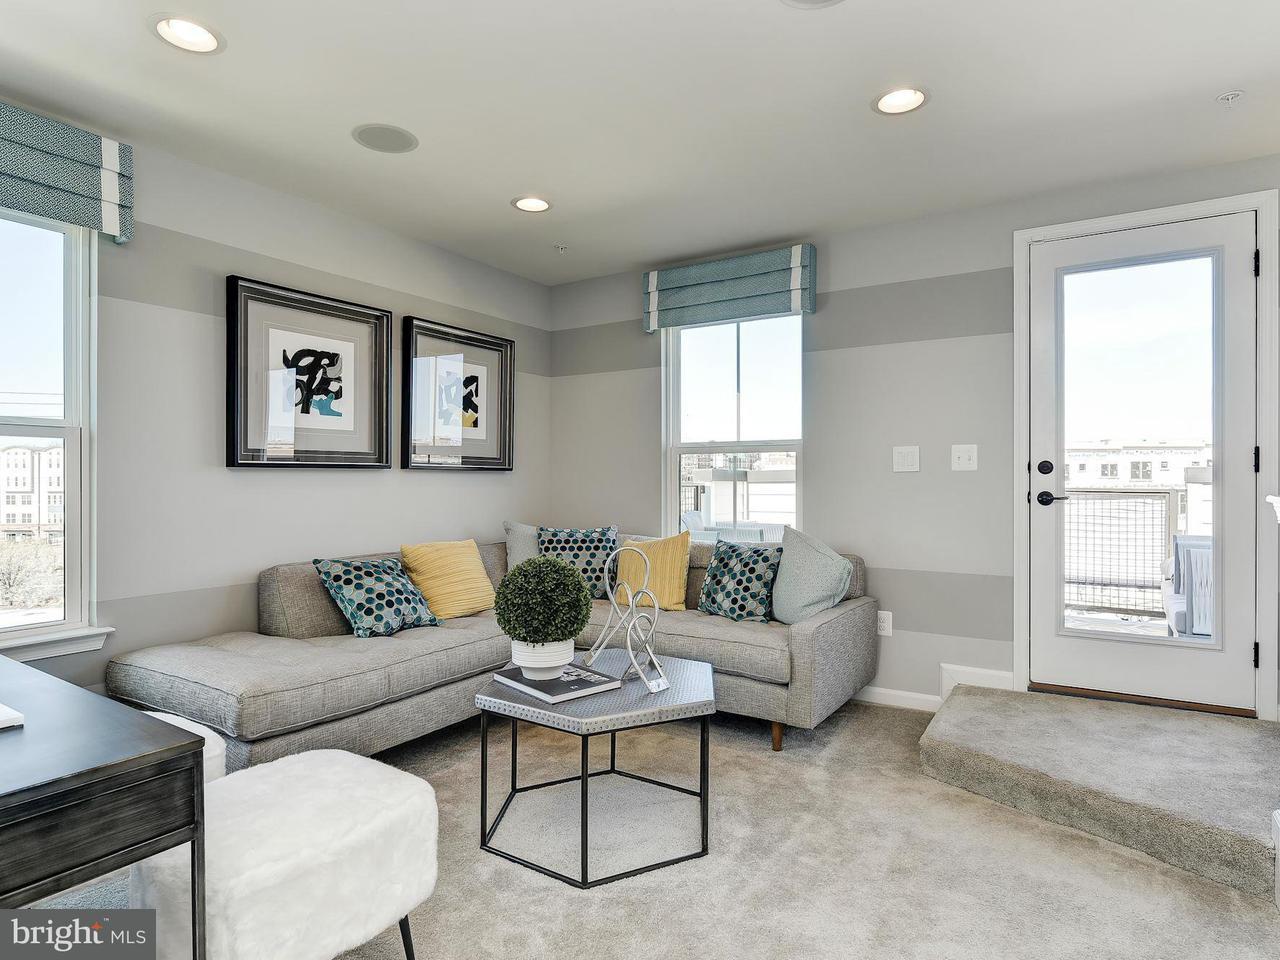 Additional photo for property listing at 3621 JAMISON ST NE 3621 JAMISON ST NE Washington, Distrito De Columbia 20018 Estados Unidos